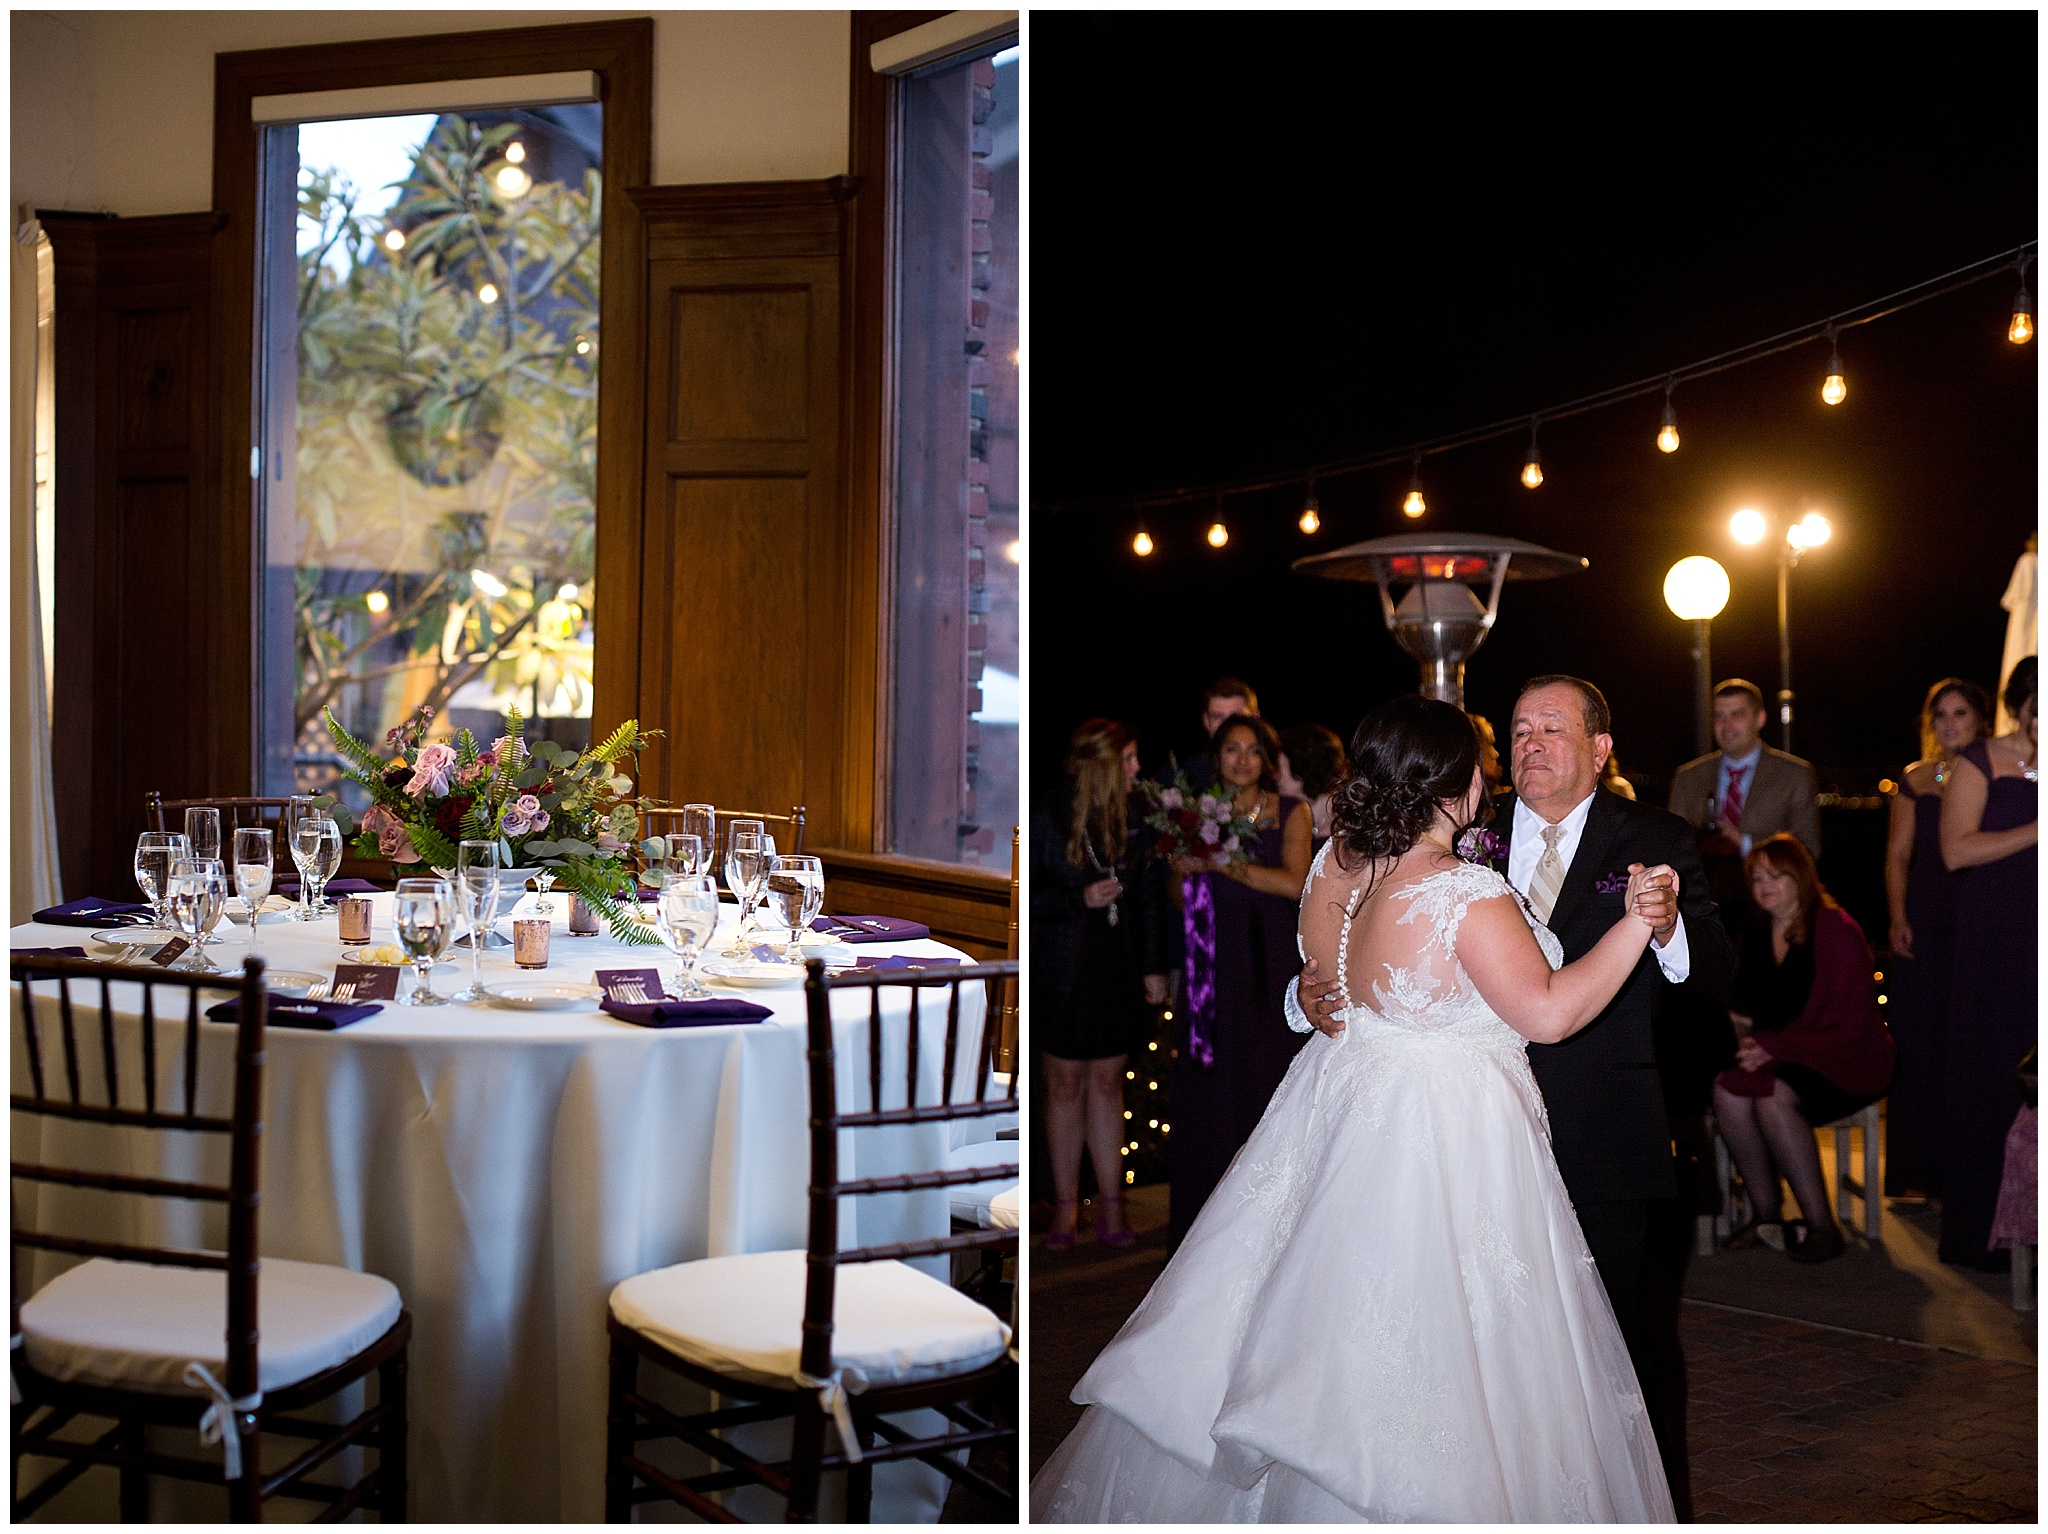 Carol_and_Grant_Wedding_3-3-18-8339.jpg